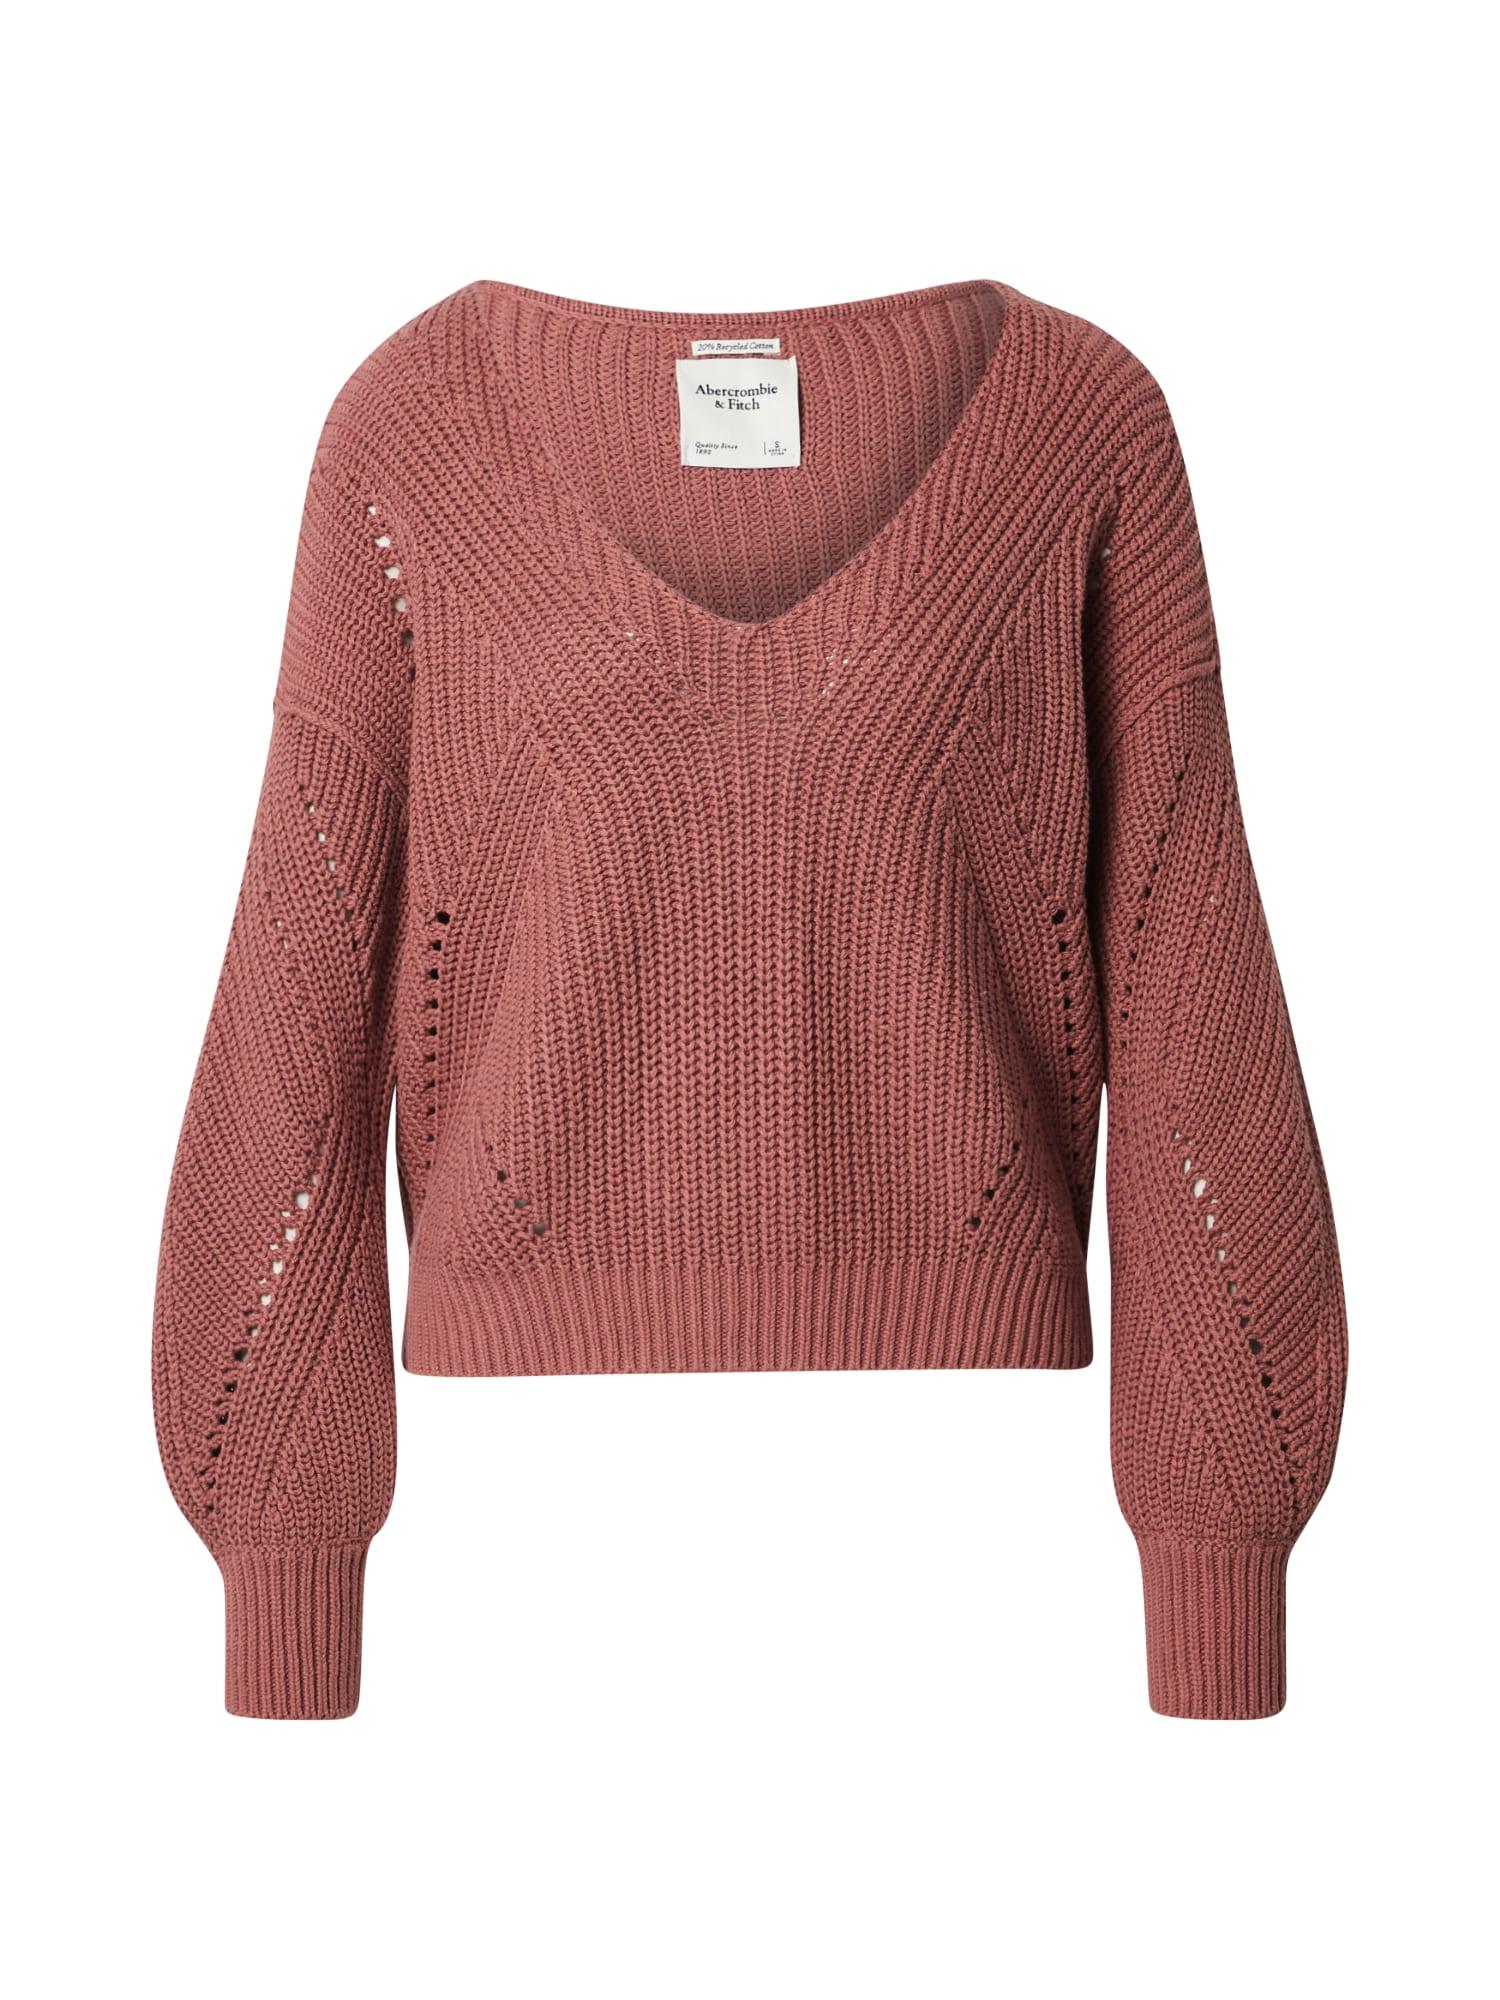 Abercrombie & Fitch Megztinis pastelinė raudona